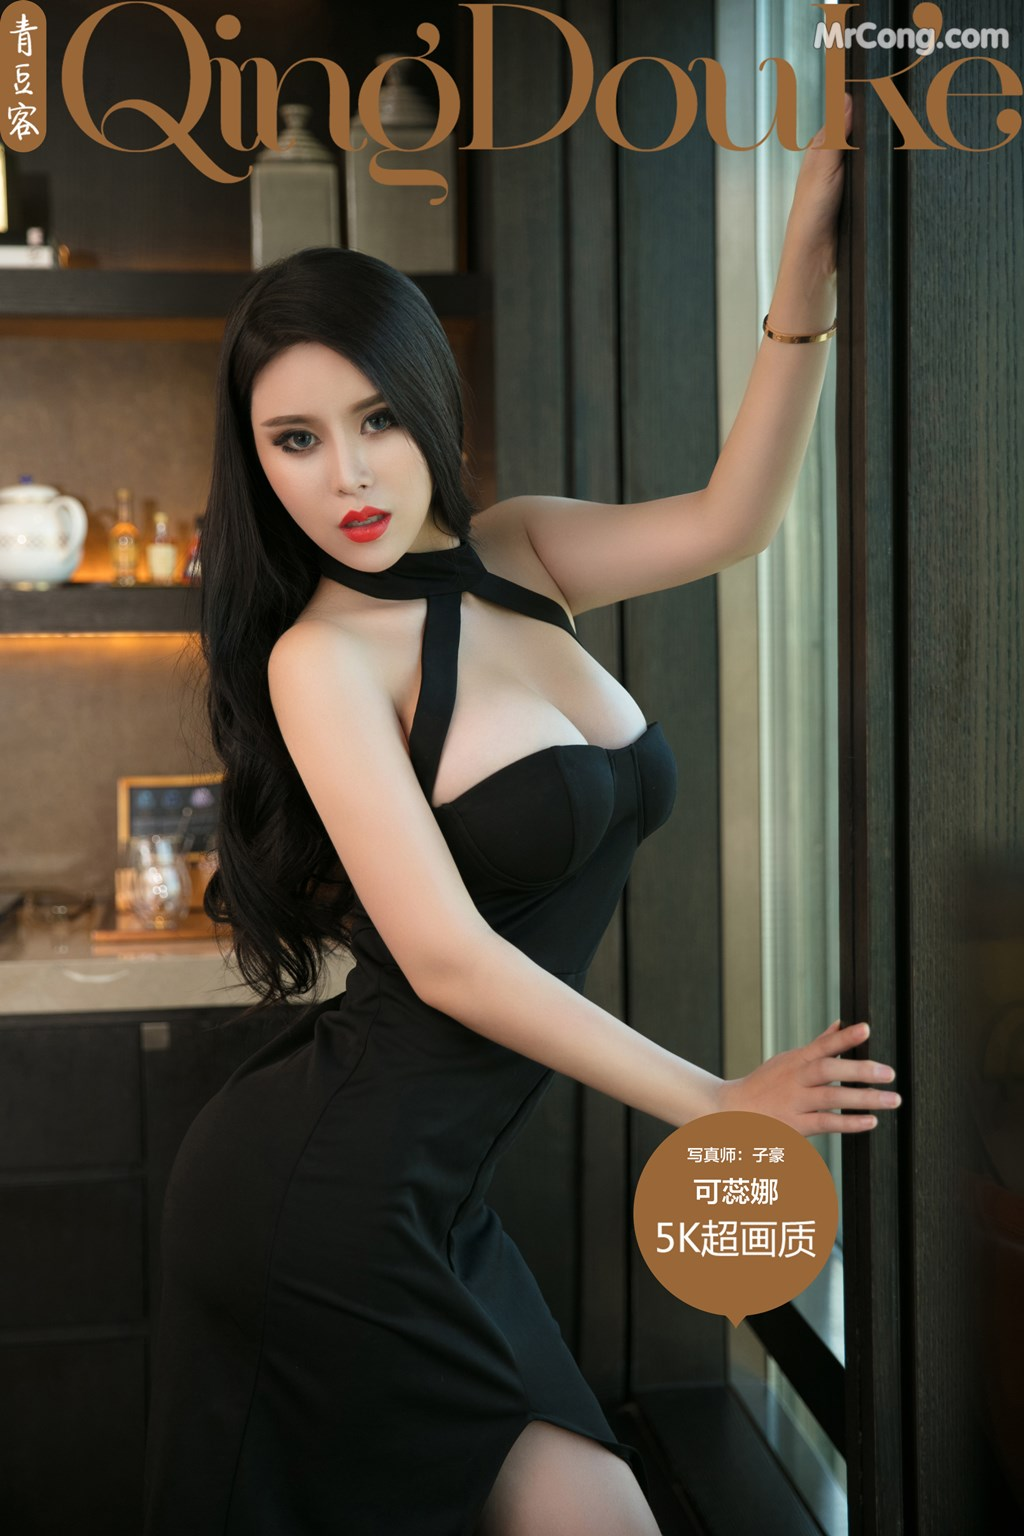 QingDouKe 2017-11-05: Người mẫu Ke Rui Na (可蕊娜) (48 ảnh)